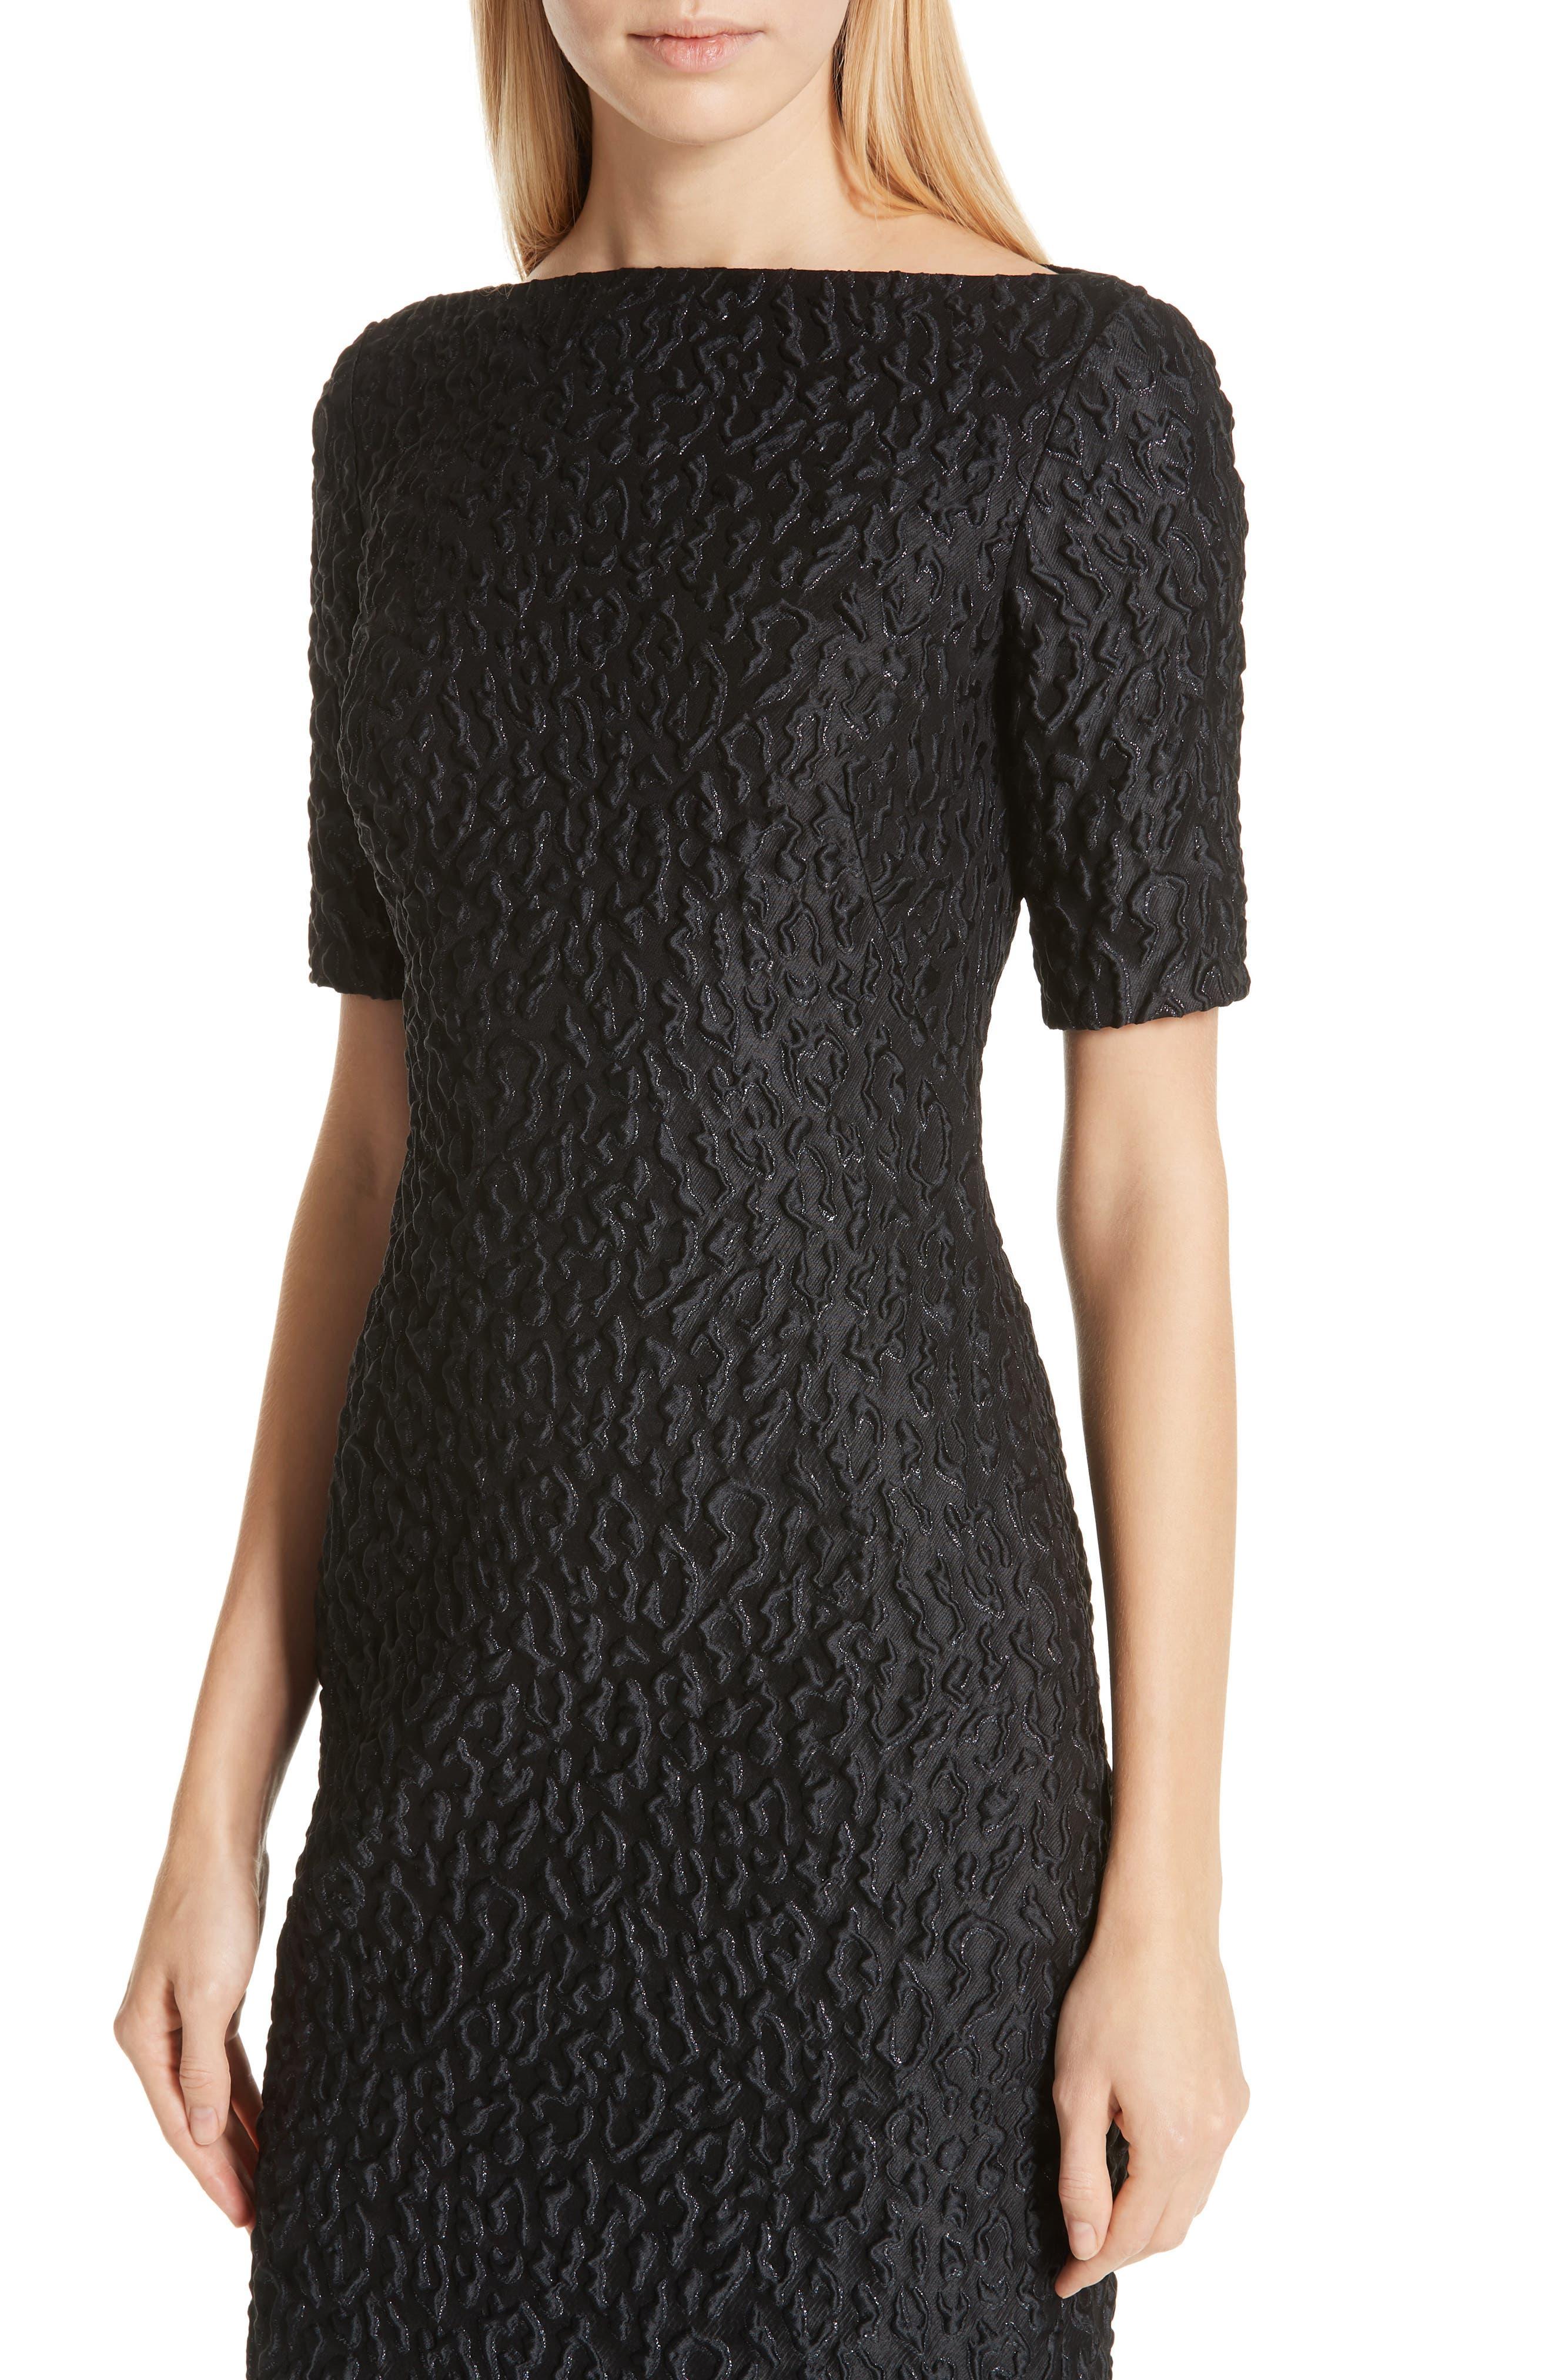 BRANDON MAXWELL, Leopard Jacquard Sheath Dress, Alternate thumbnail 5, color, BLACK